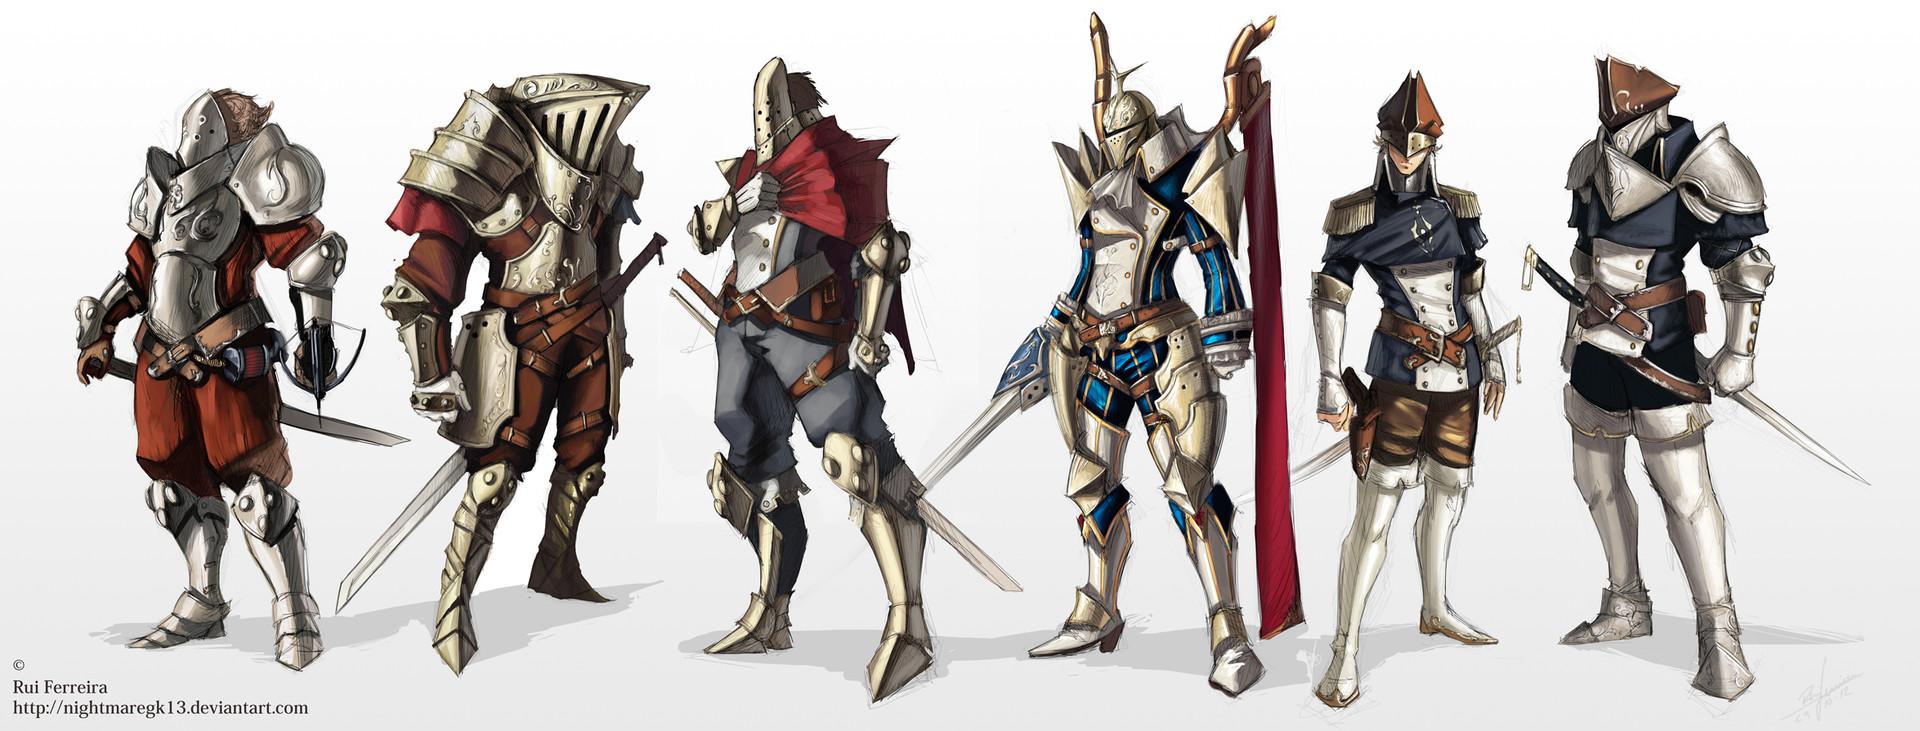 Rui ferreira warriors of arlos